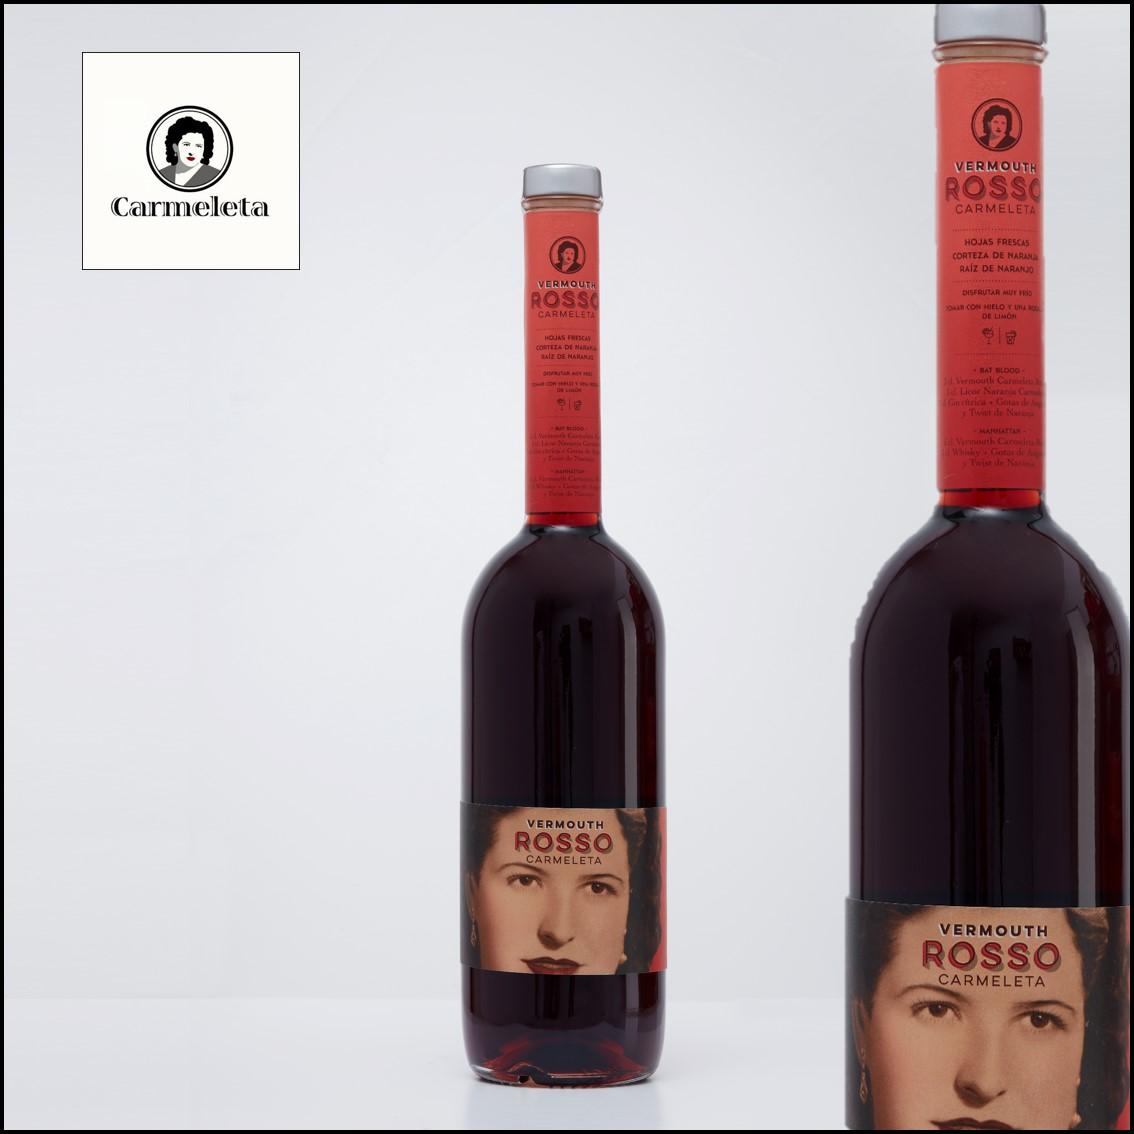 Carmeleta Vermut Rosso